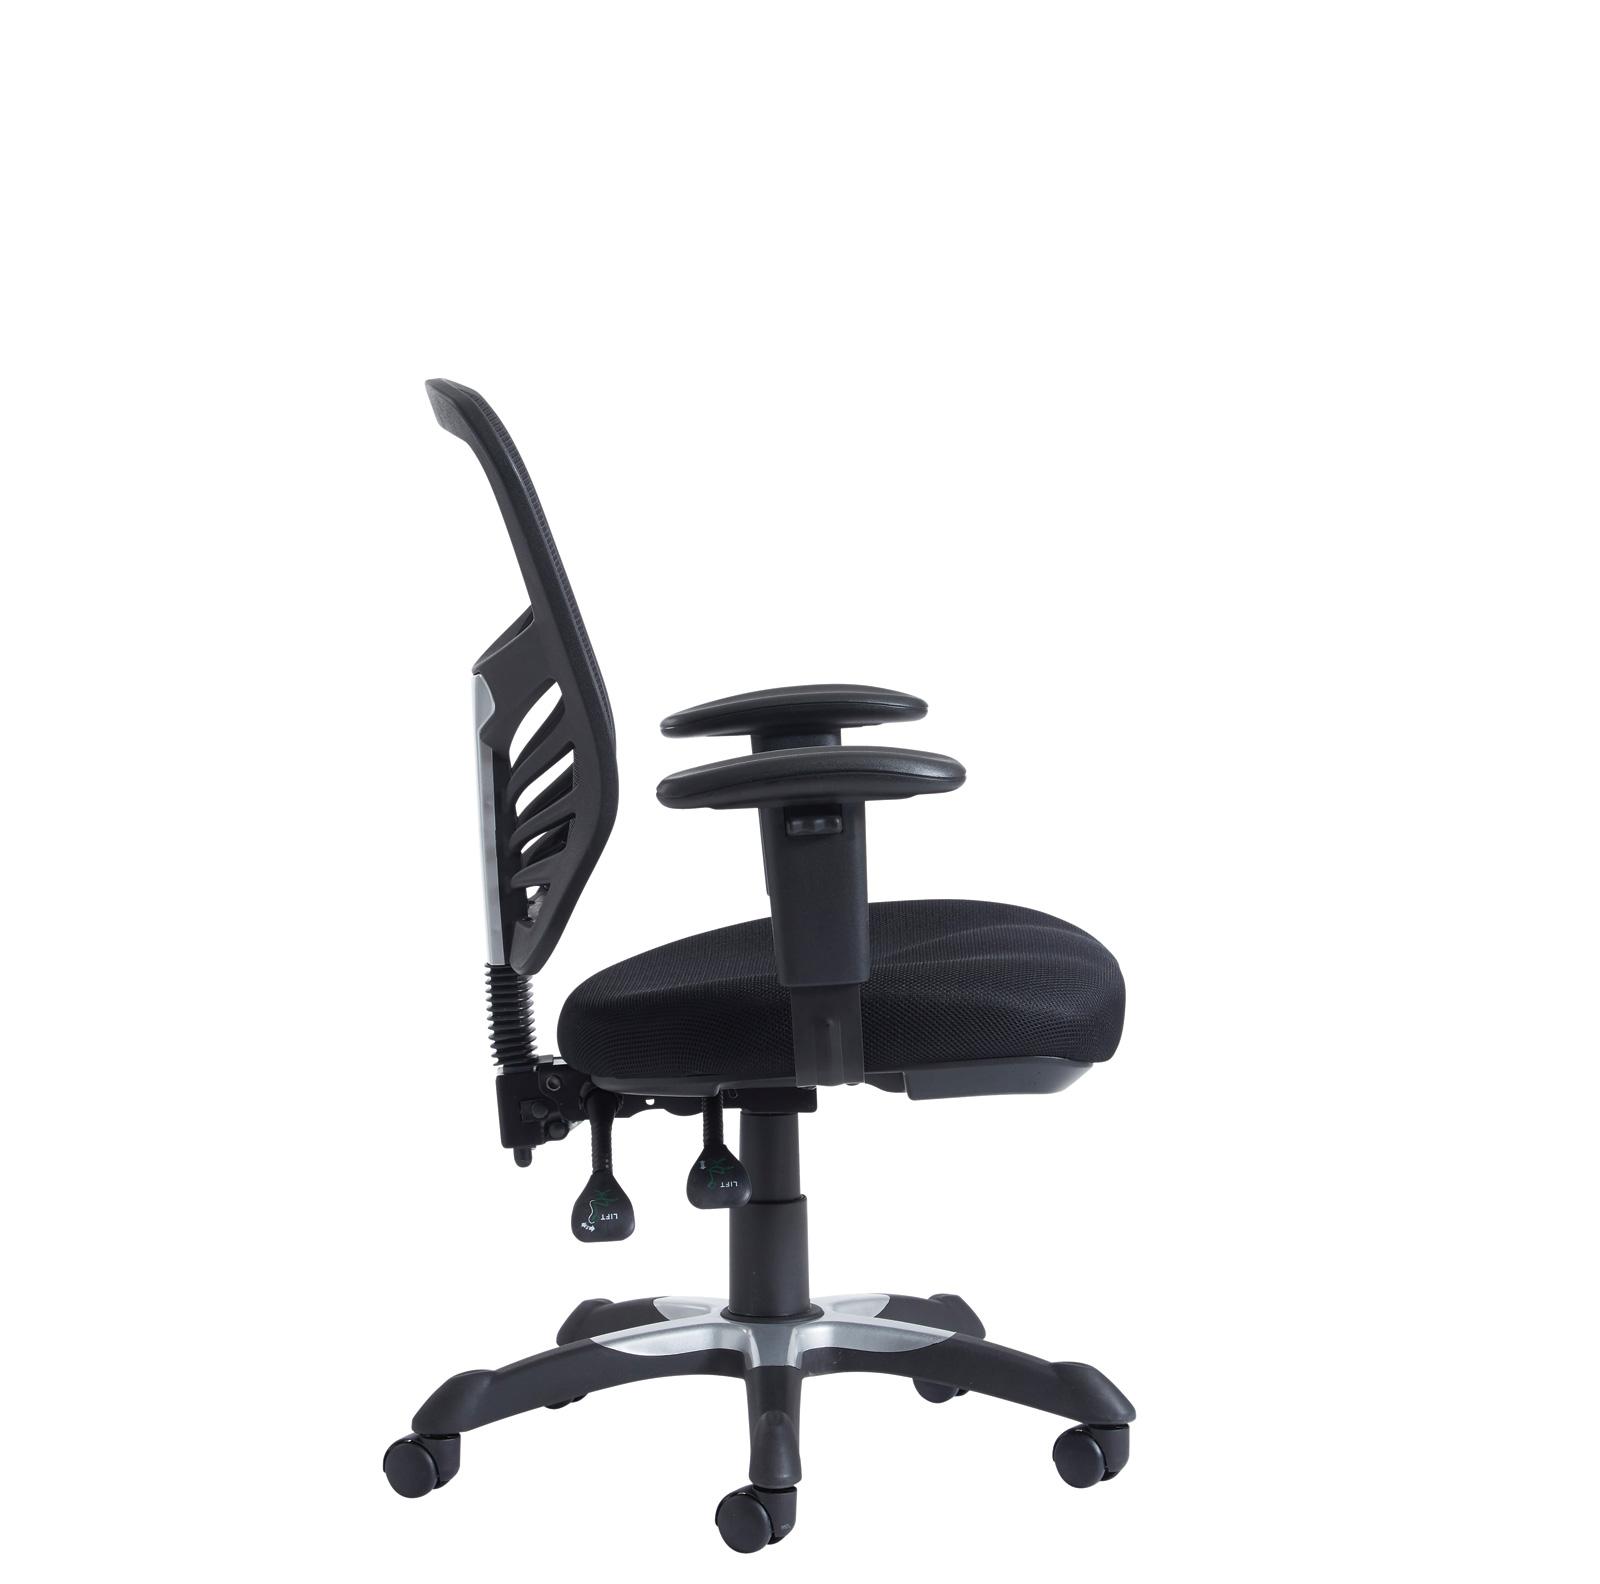 vantage fabric mesh task chair arms black bmg office equipment